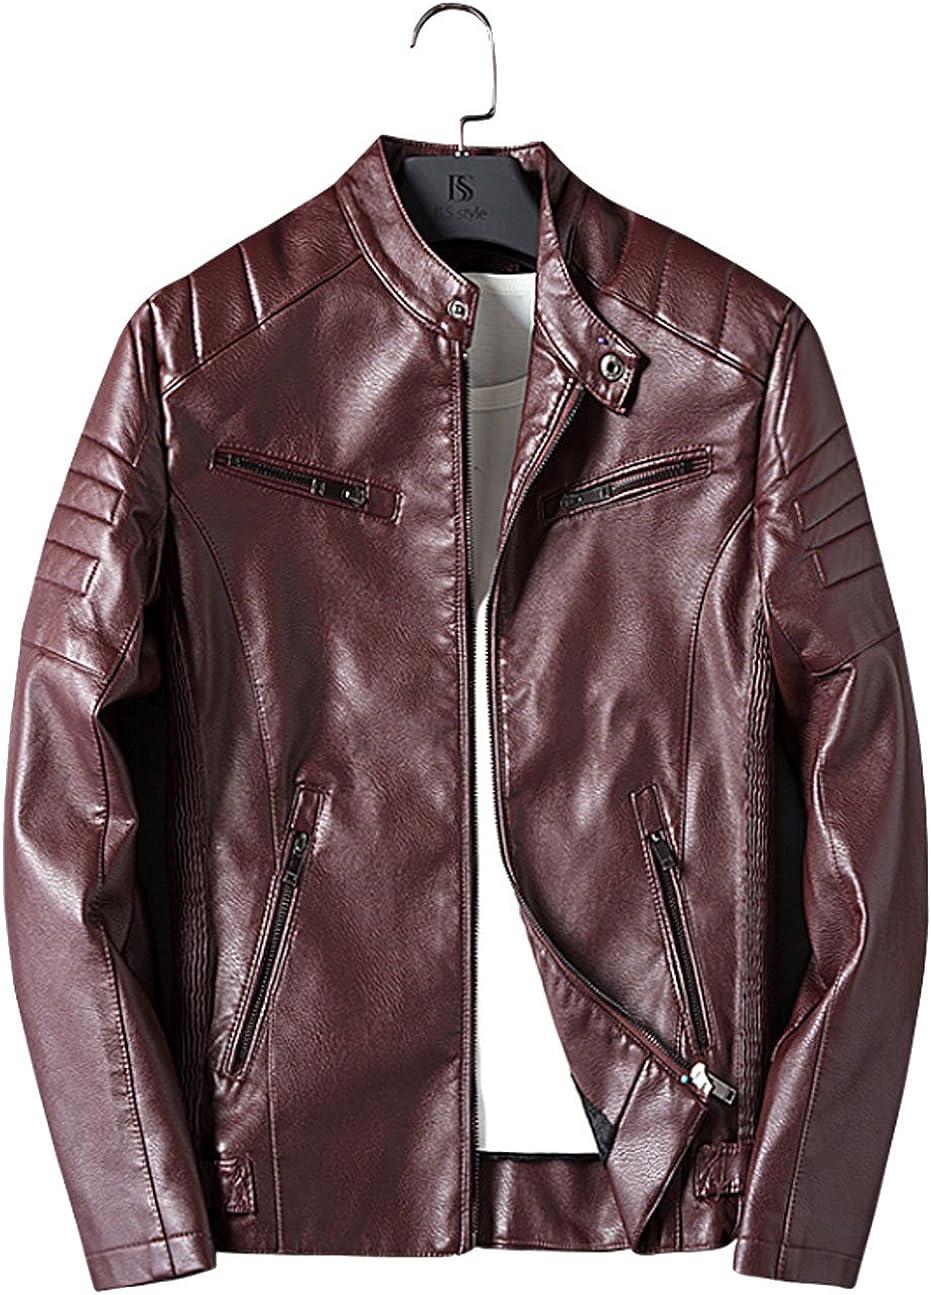 YangguTown YGT Mens Motor Fashion PU Leather Slim Stand Collar Jackets Short Coat